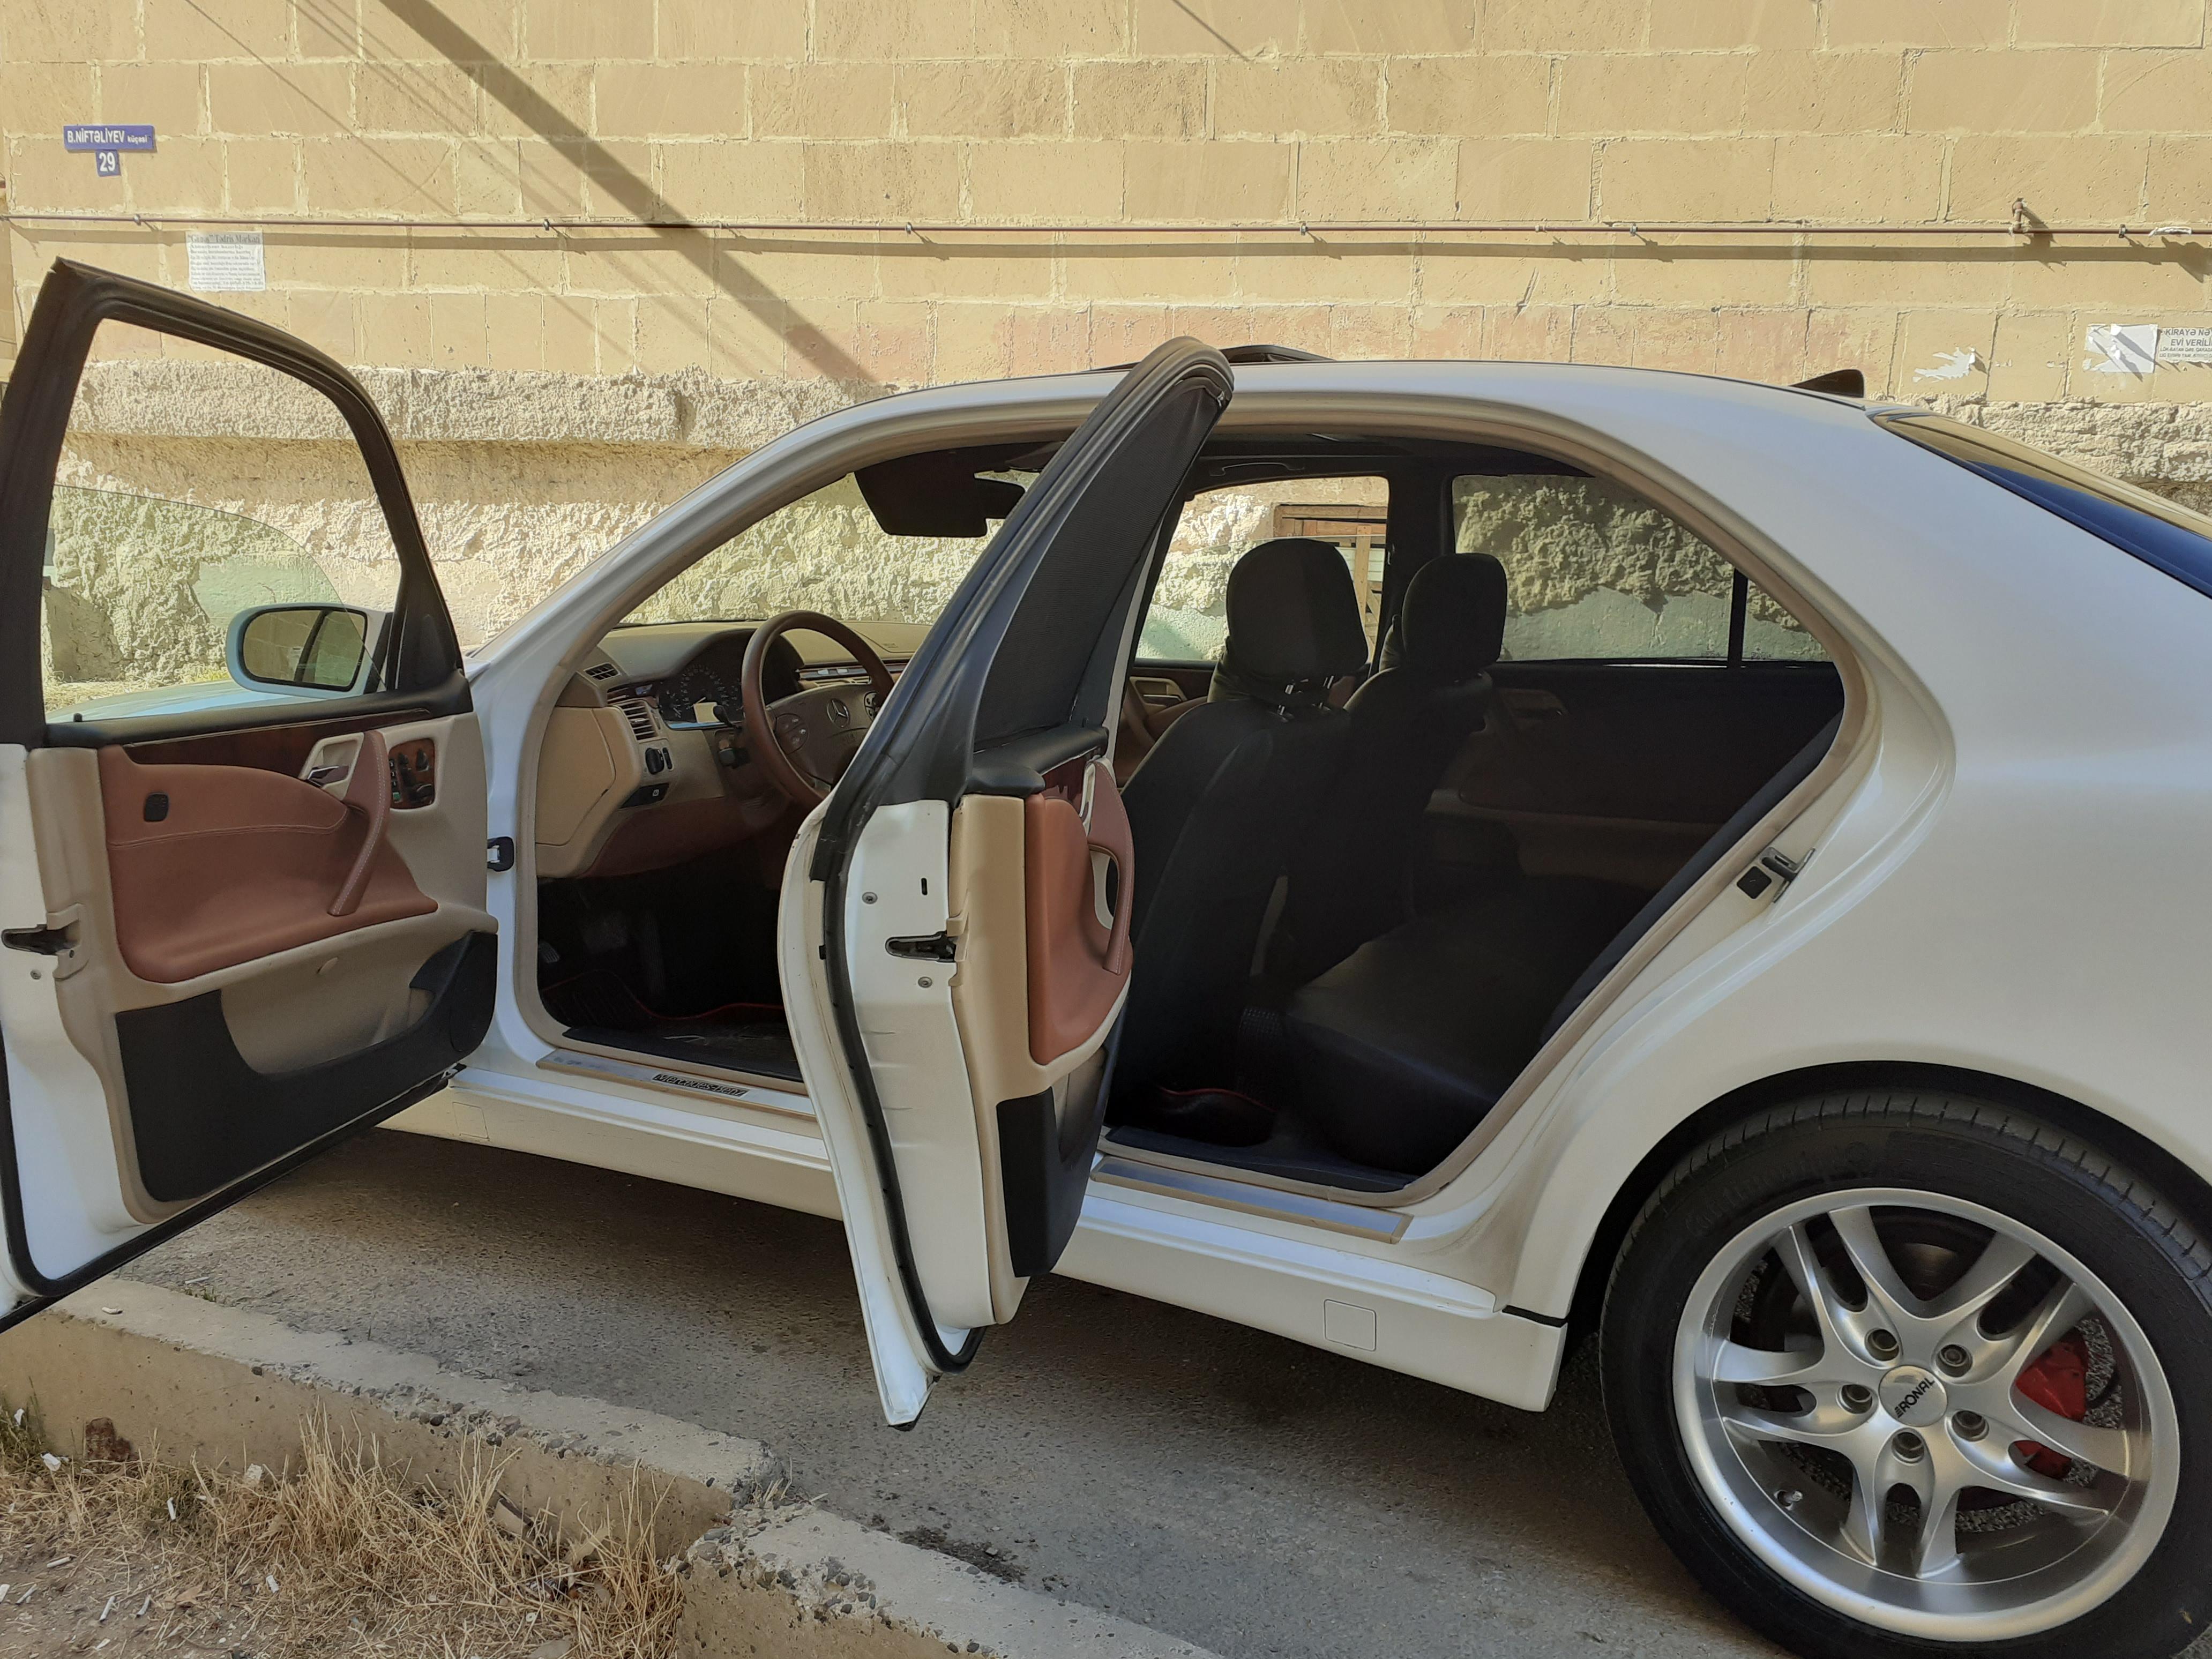 Mercedes-Benz E 240 2.6(lt) 2001 İkinci əl  $15800